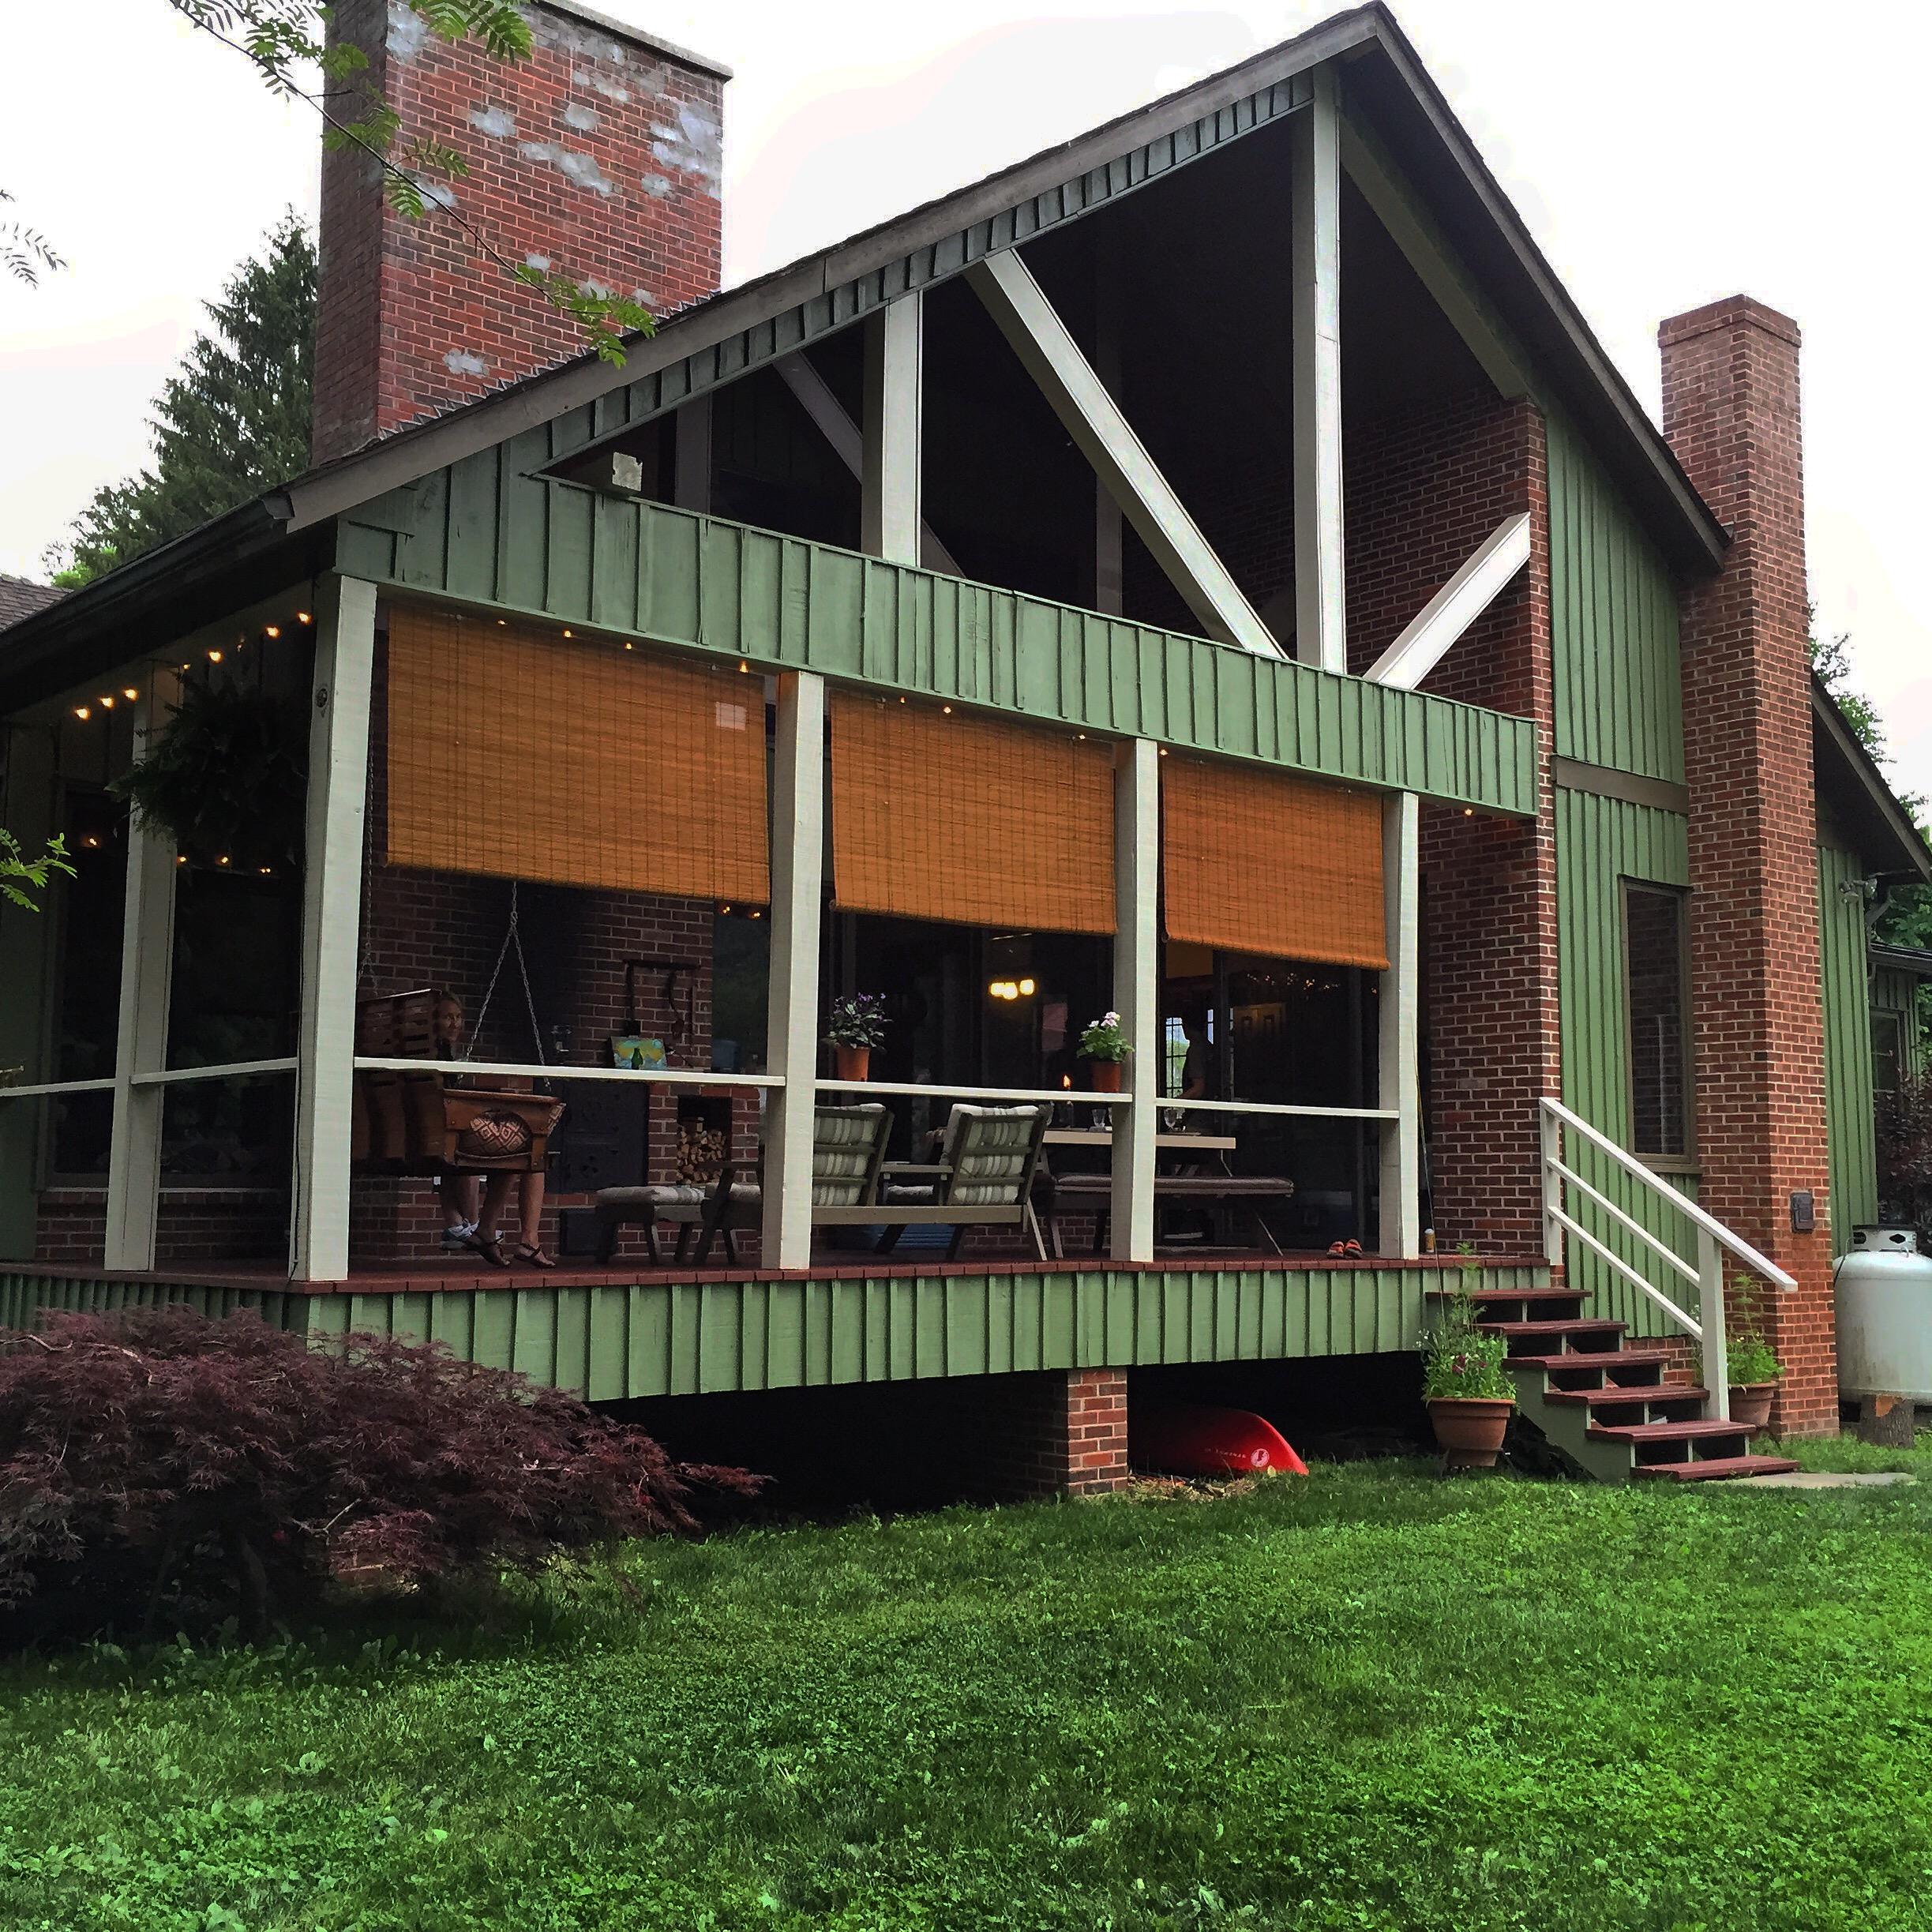 Knapp's Creek Trout Lodge, Marlinton WV